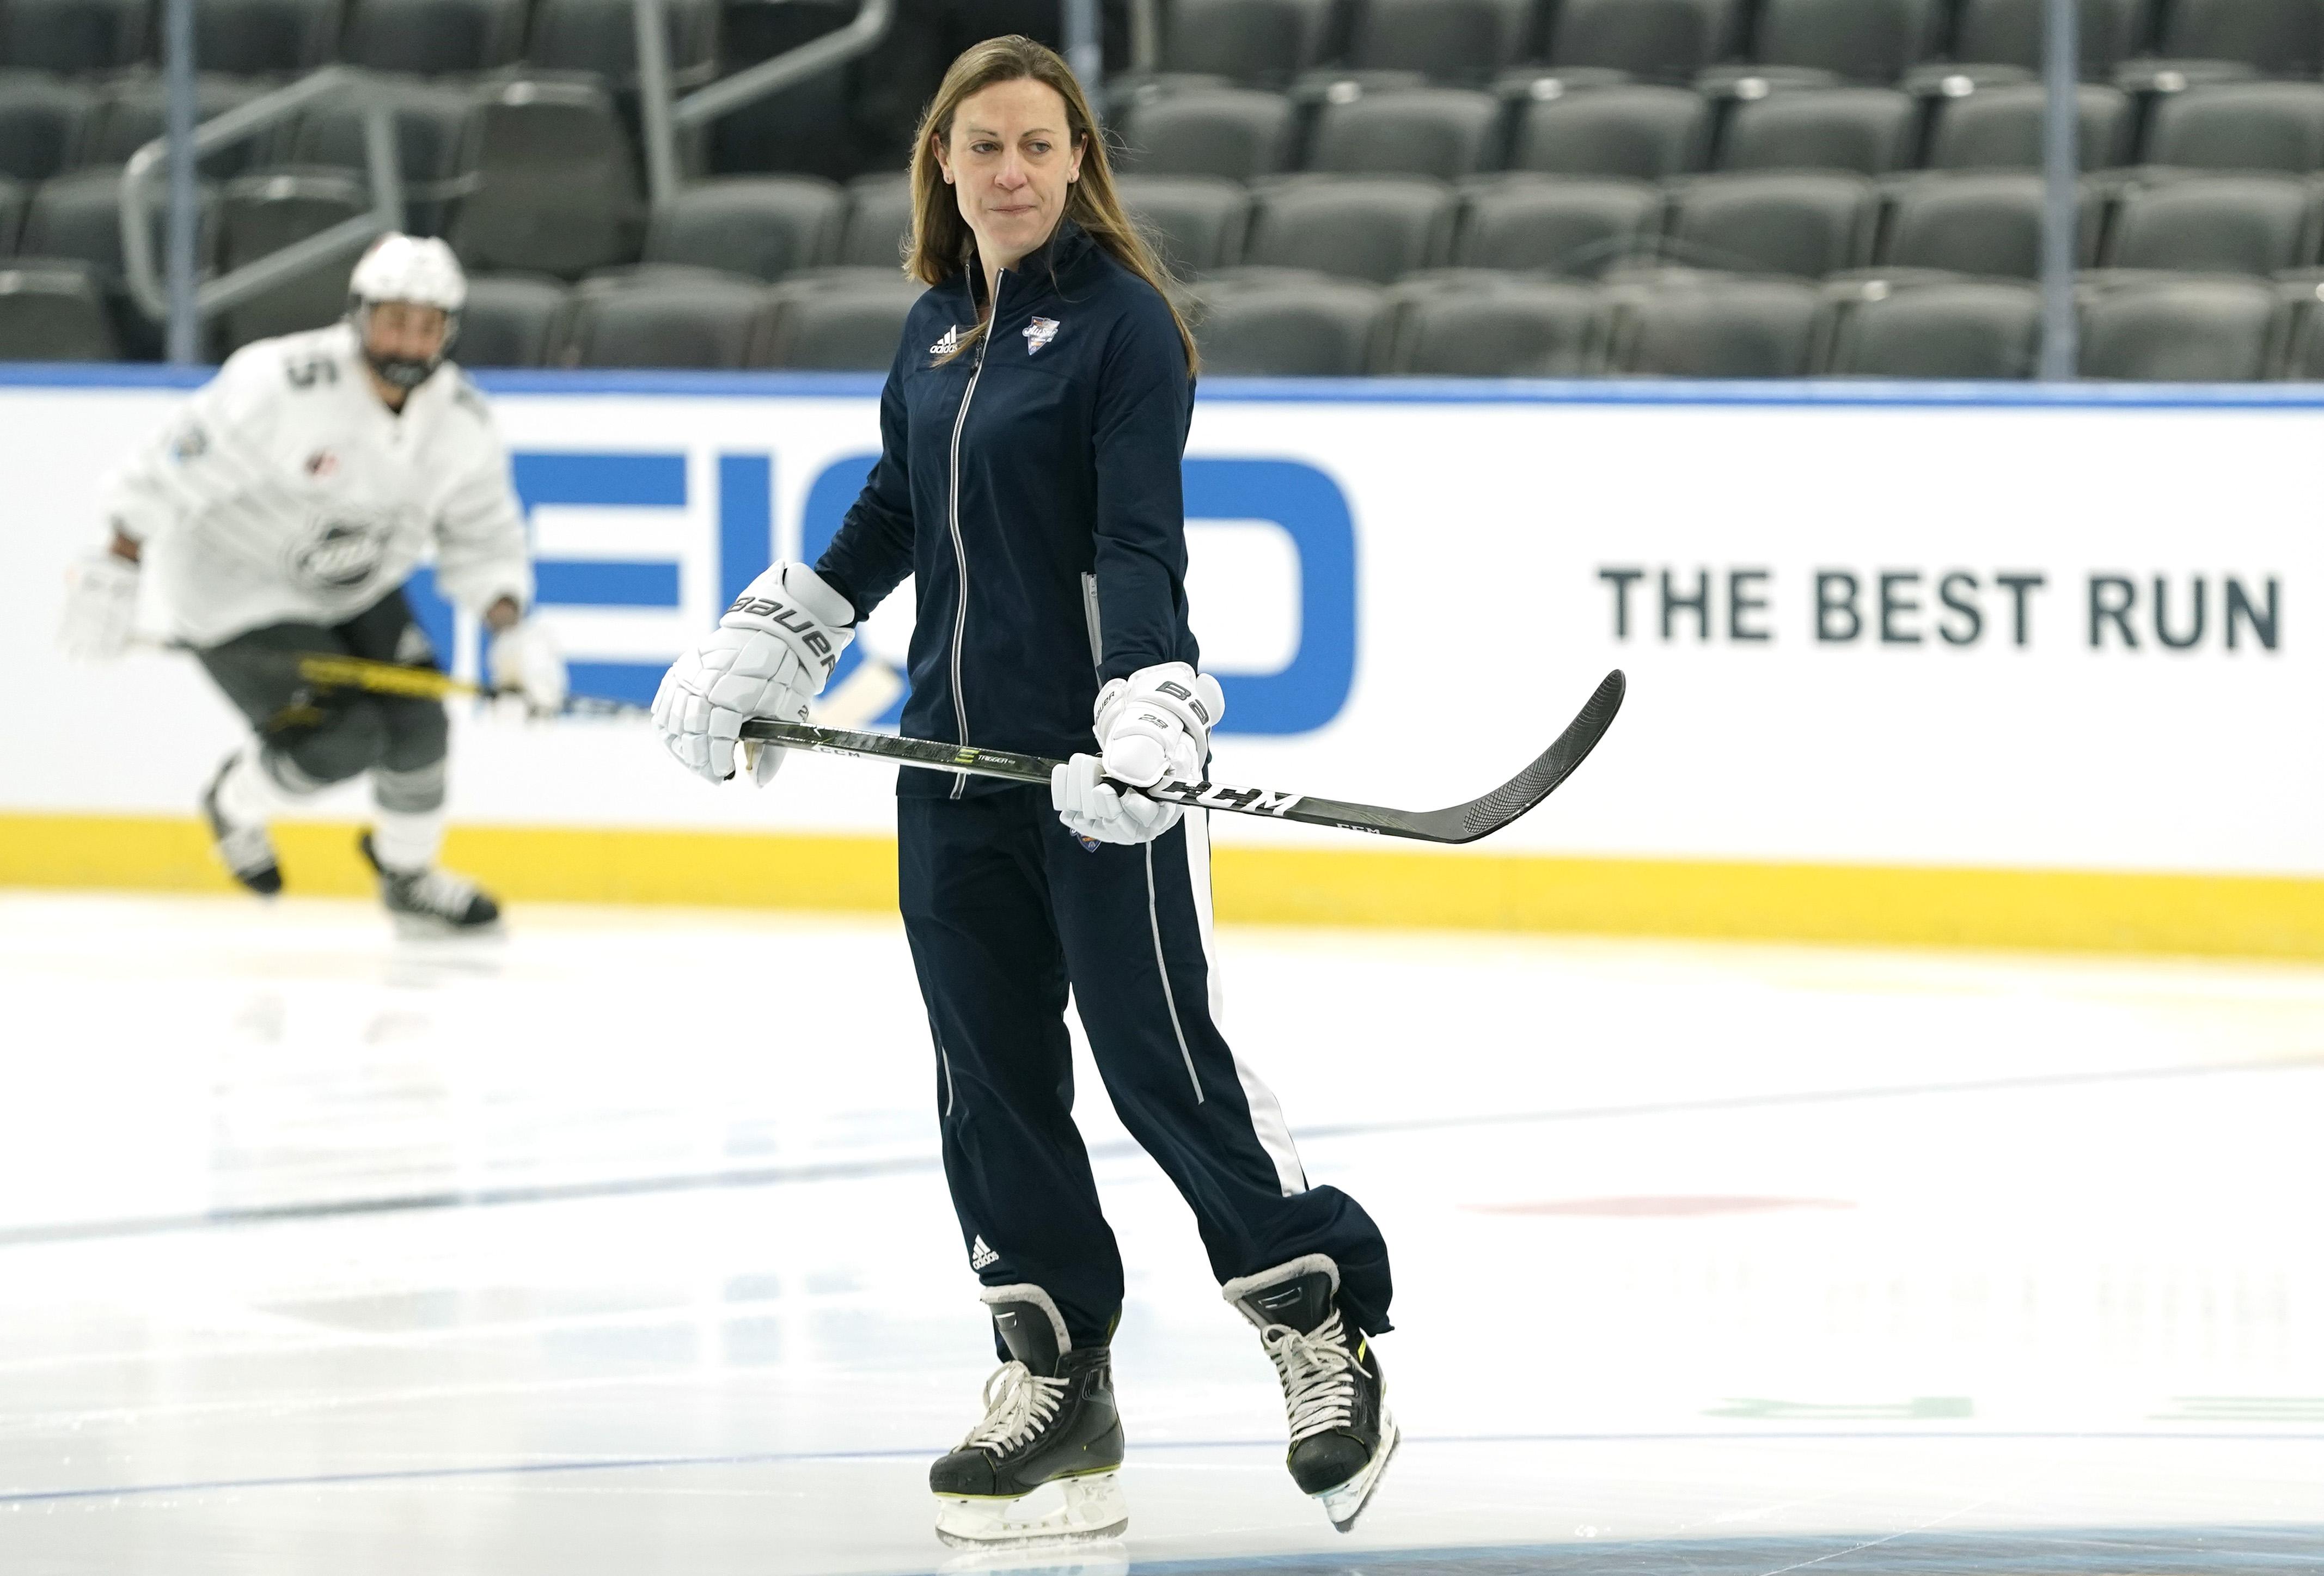 2020 NHL All-Star - Elite Women's Practice & Media Availability